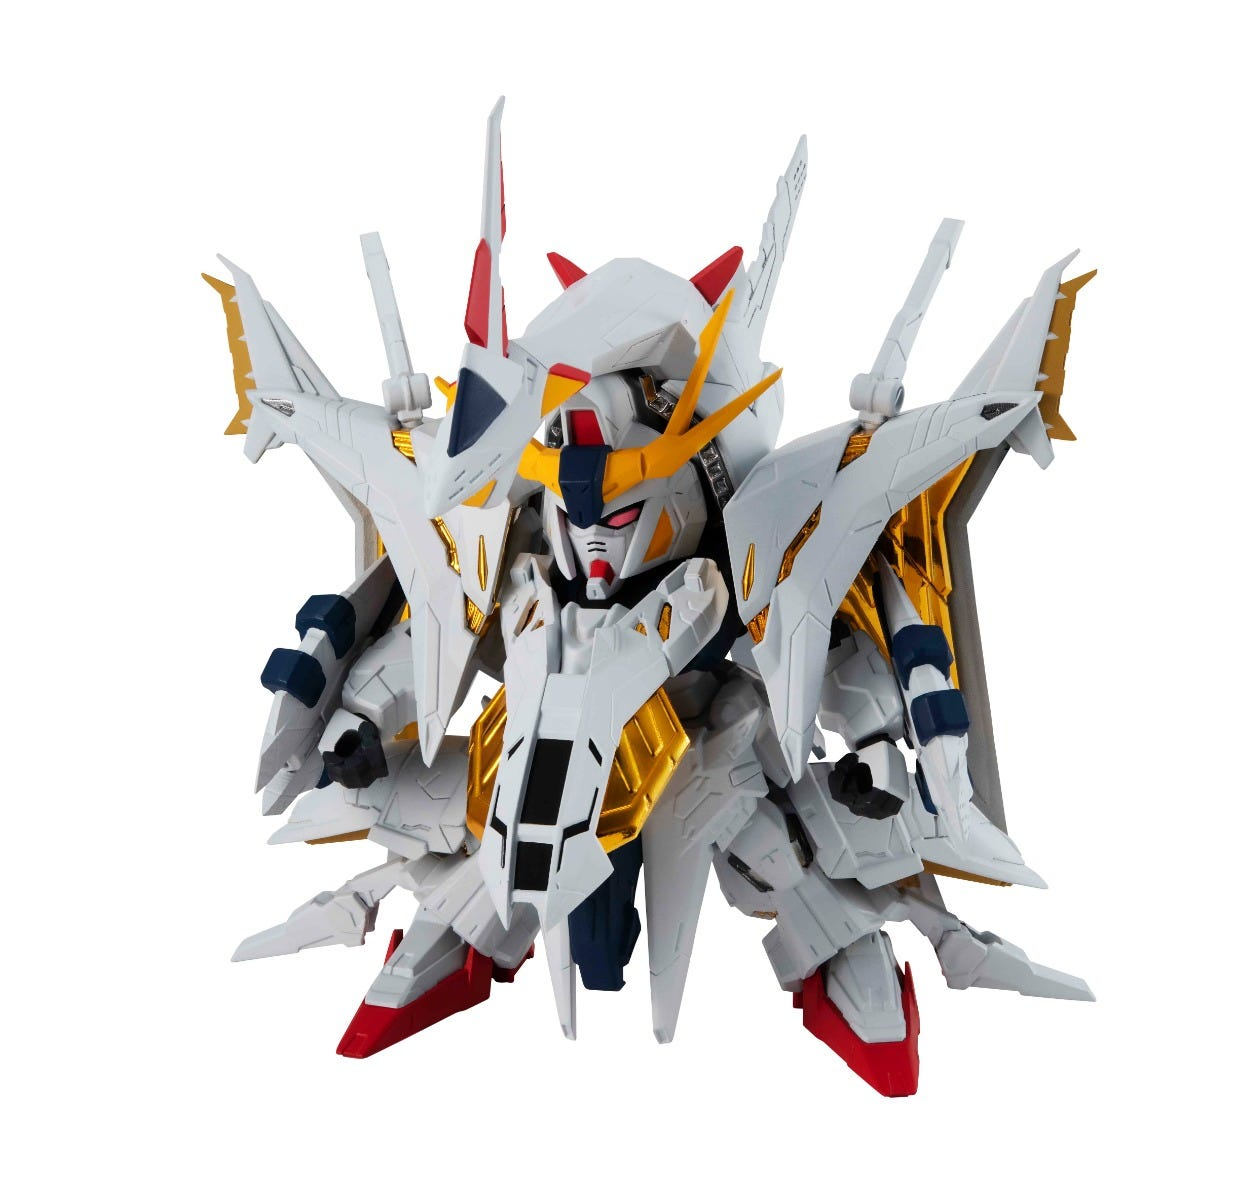 Bandai Spirits NXEDGE Style XI Penelope Mobile Suit Gundam Hathaway